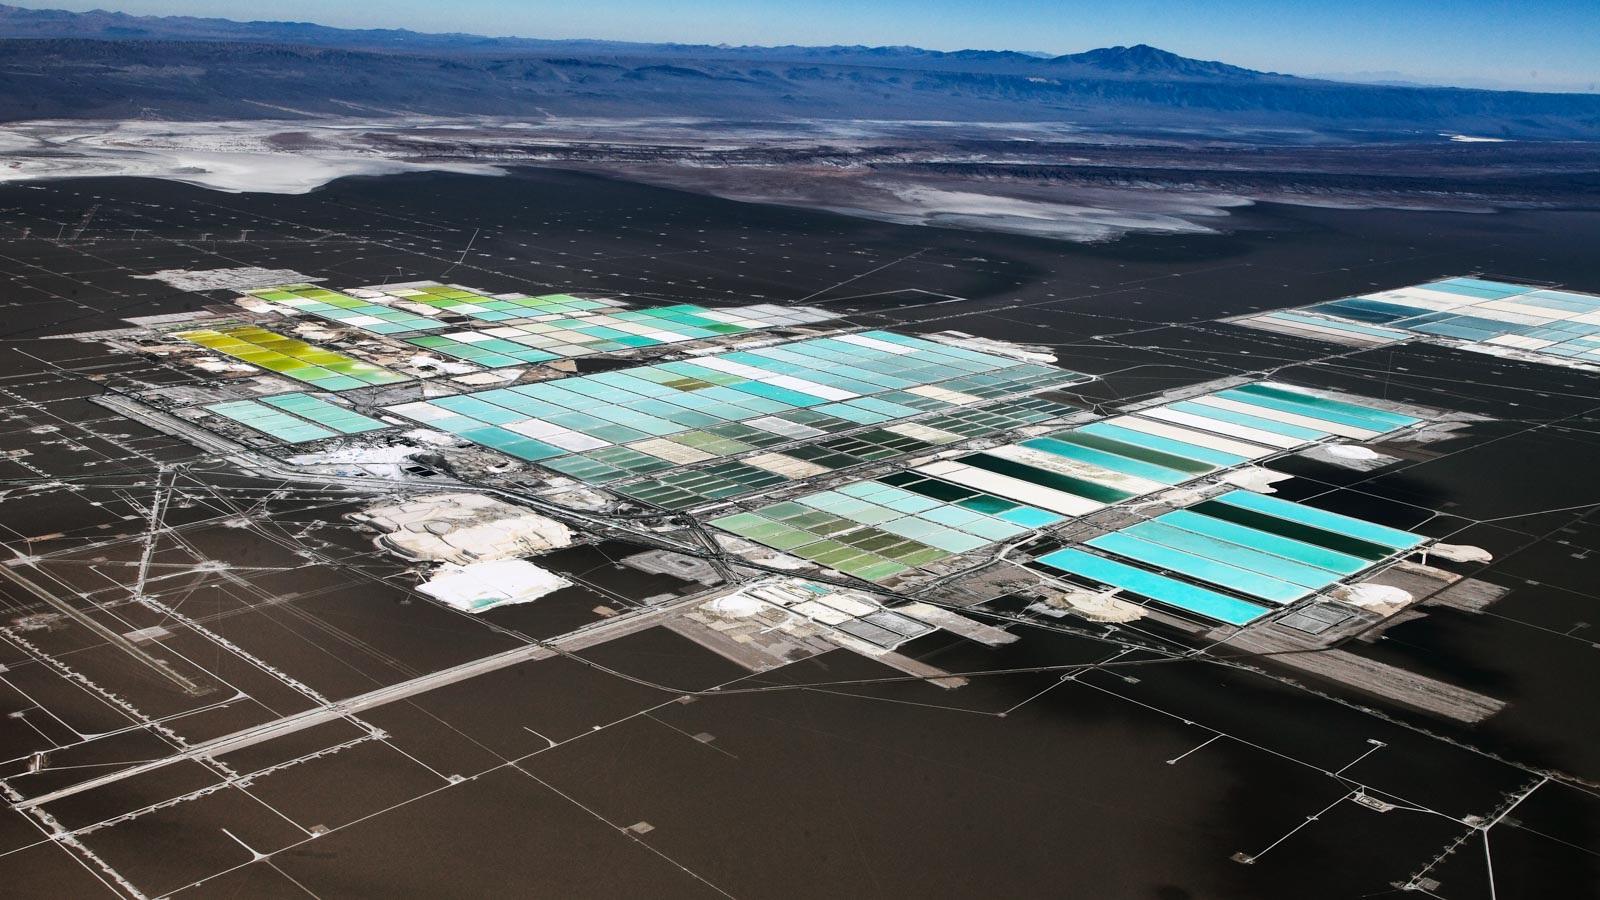 Evaporation ponds at SQM's lithium mining site in the Salar de Atacama, in Chile. (Image by SQM.)